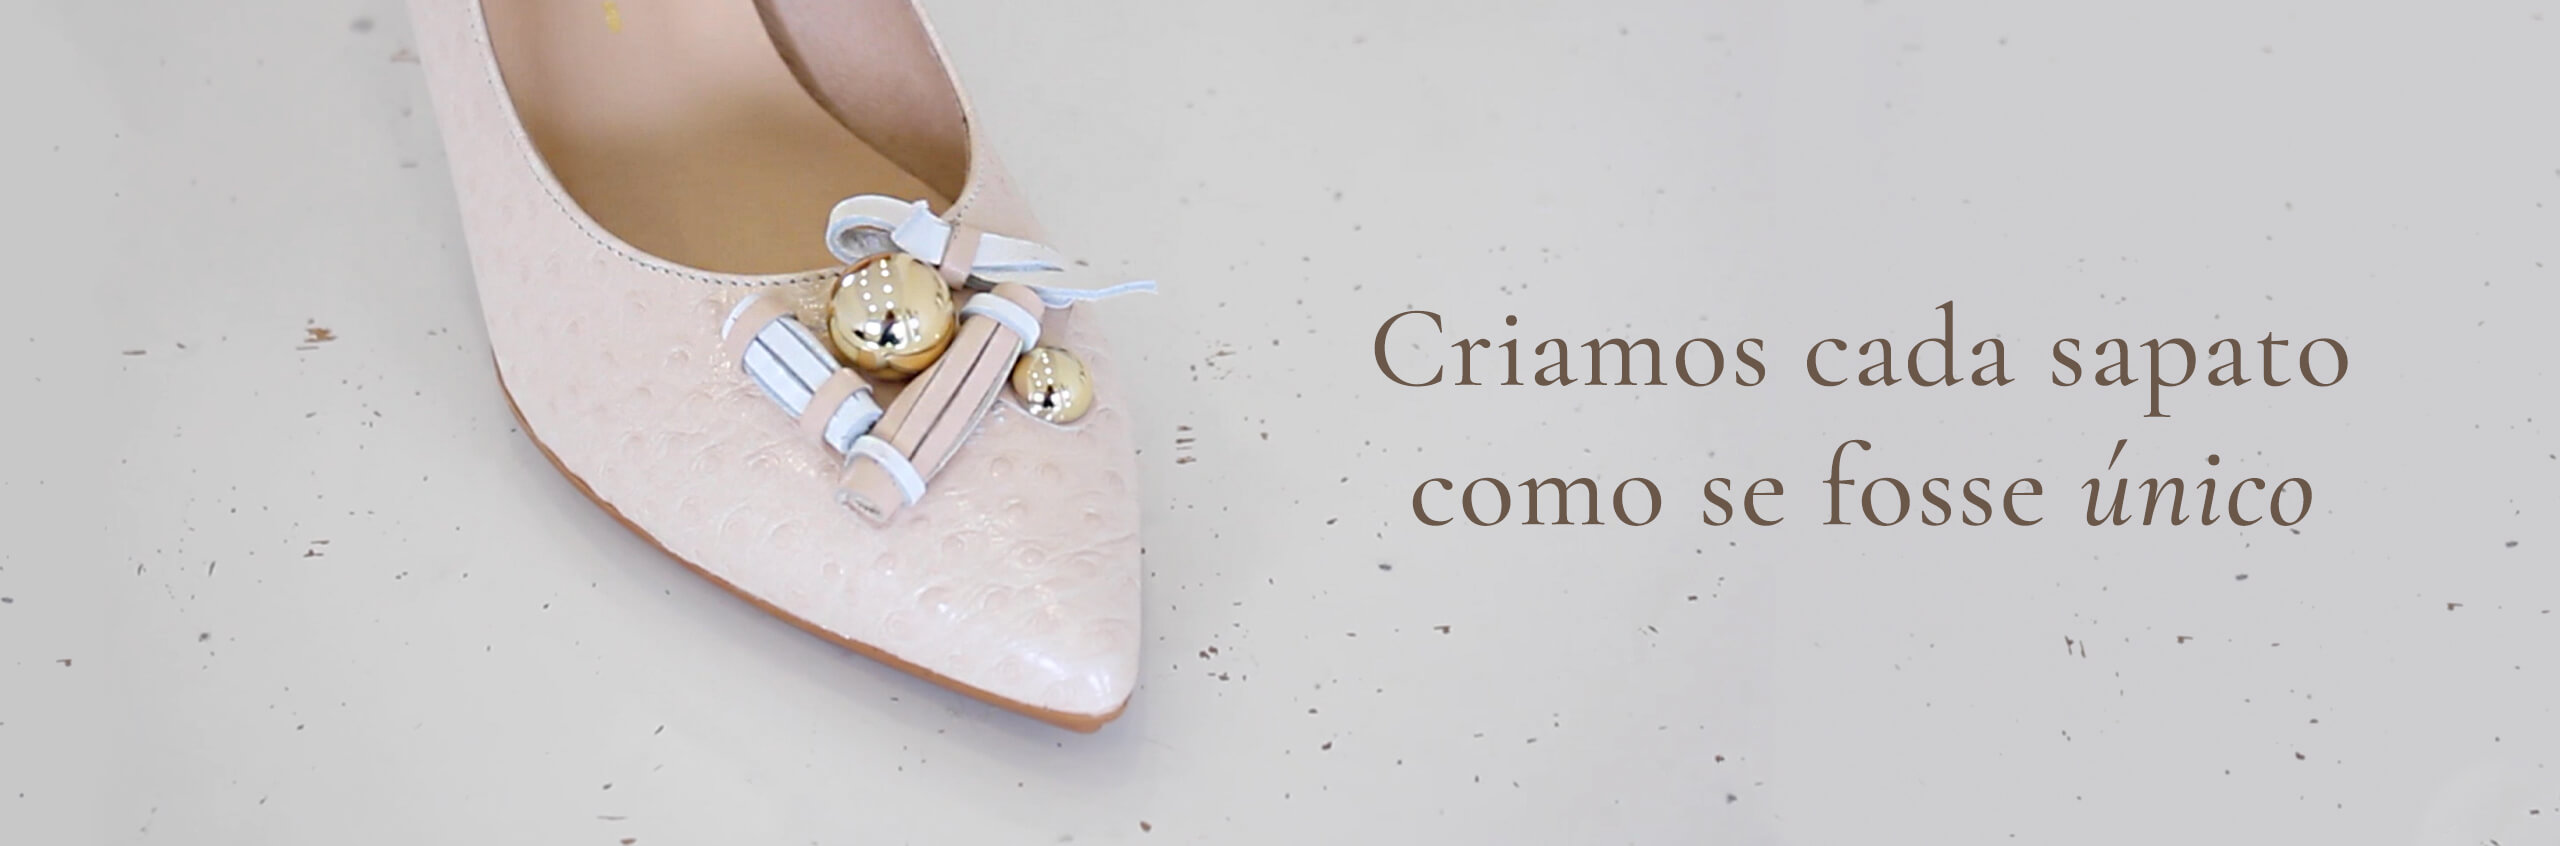 Máquina costura artesanal